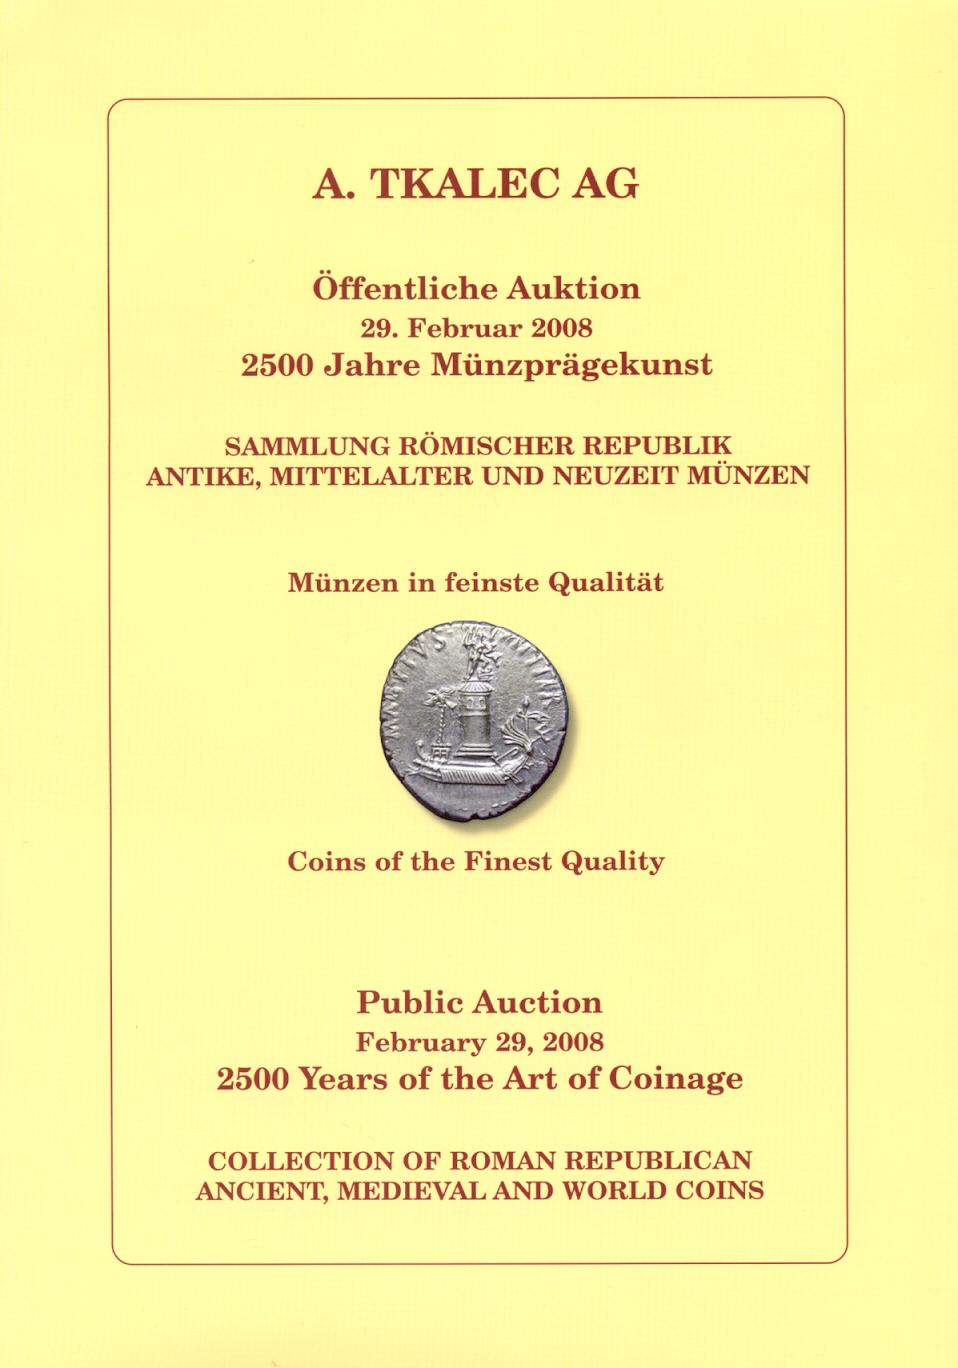 2008 AUCTION CATALOGUES MÜNZAUKTION TKALEC - KATALOG 2008: 2500 JAHRE MÜNZPRÄGEKUNST neuwertig